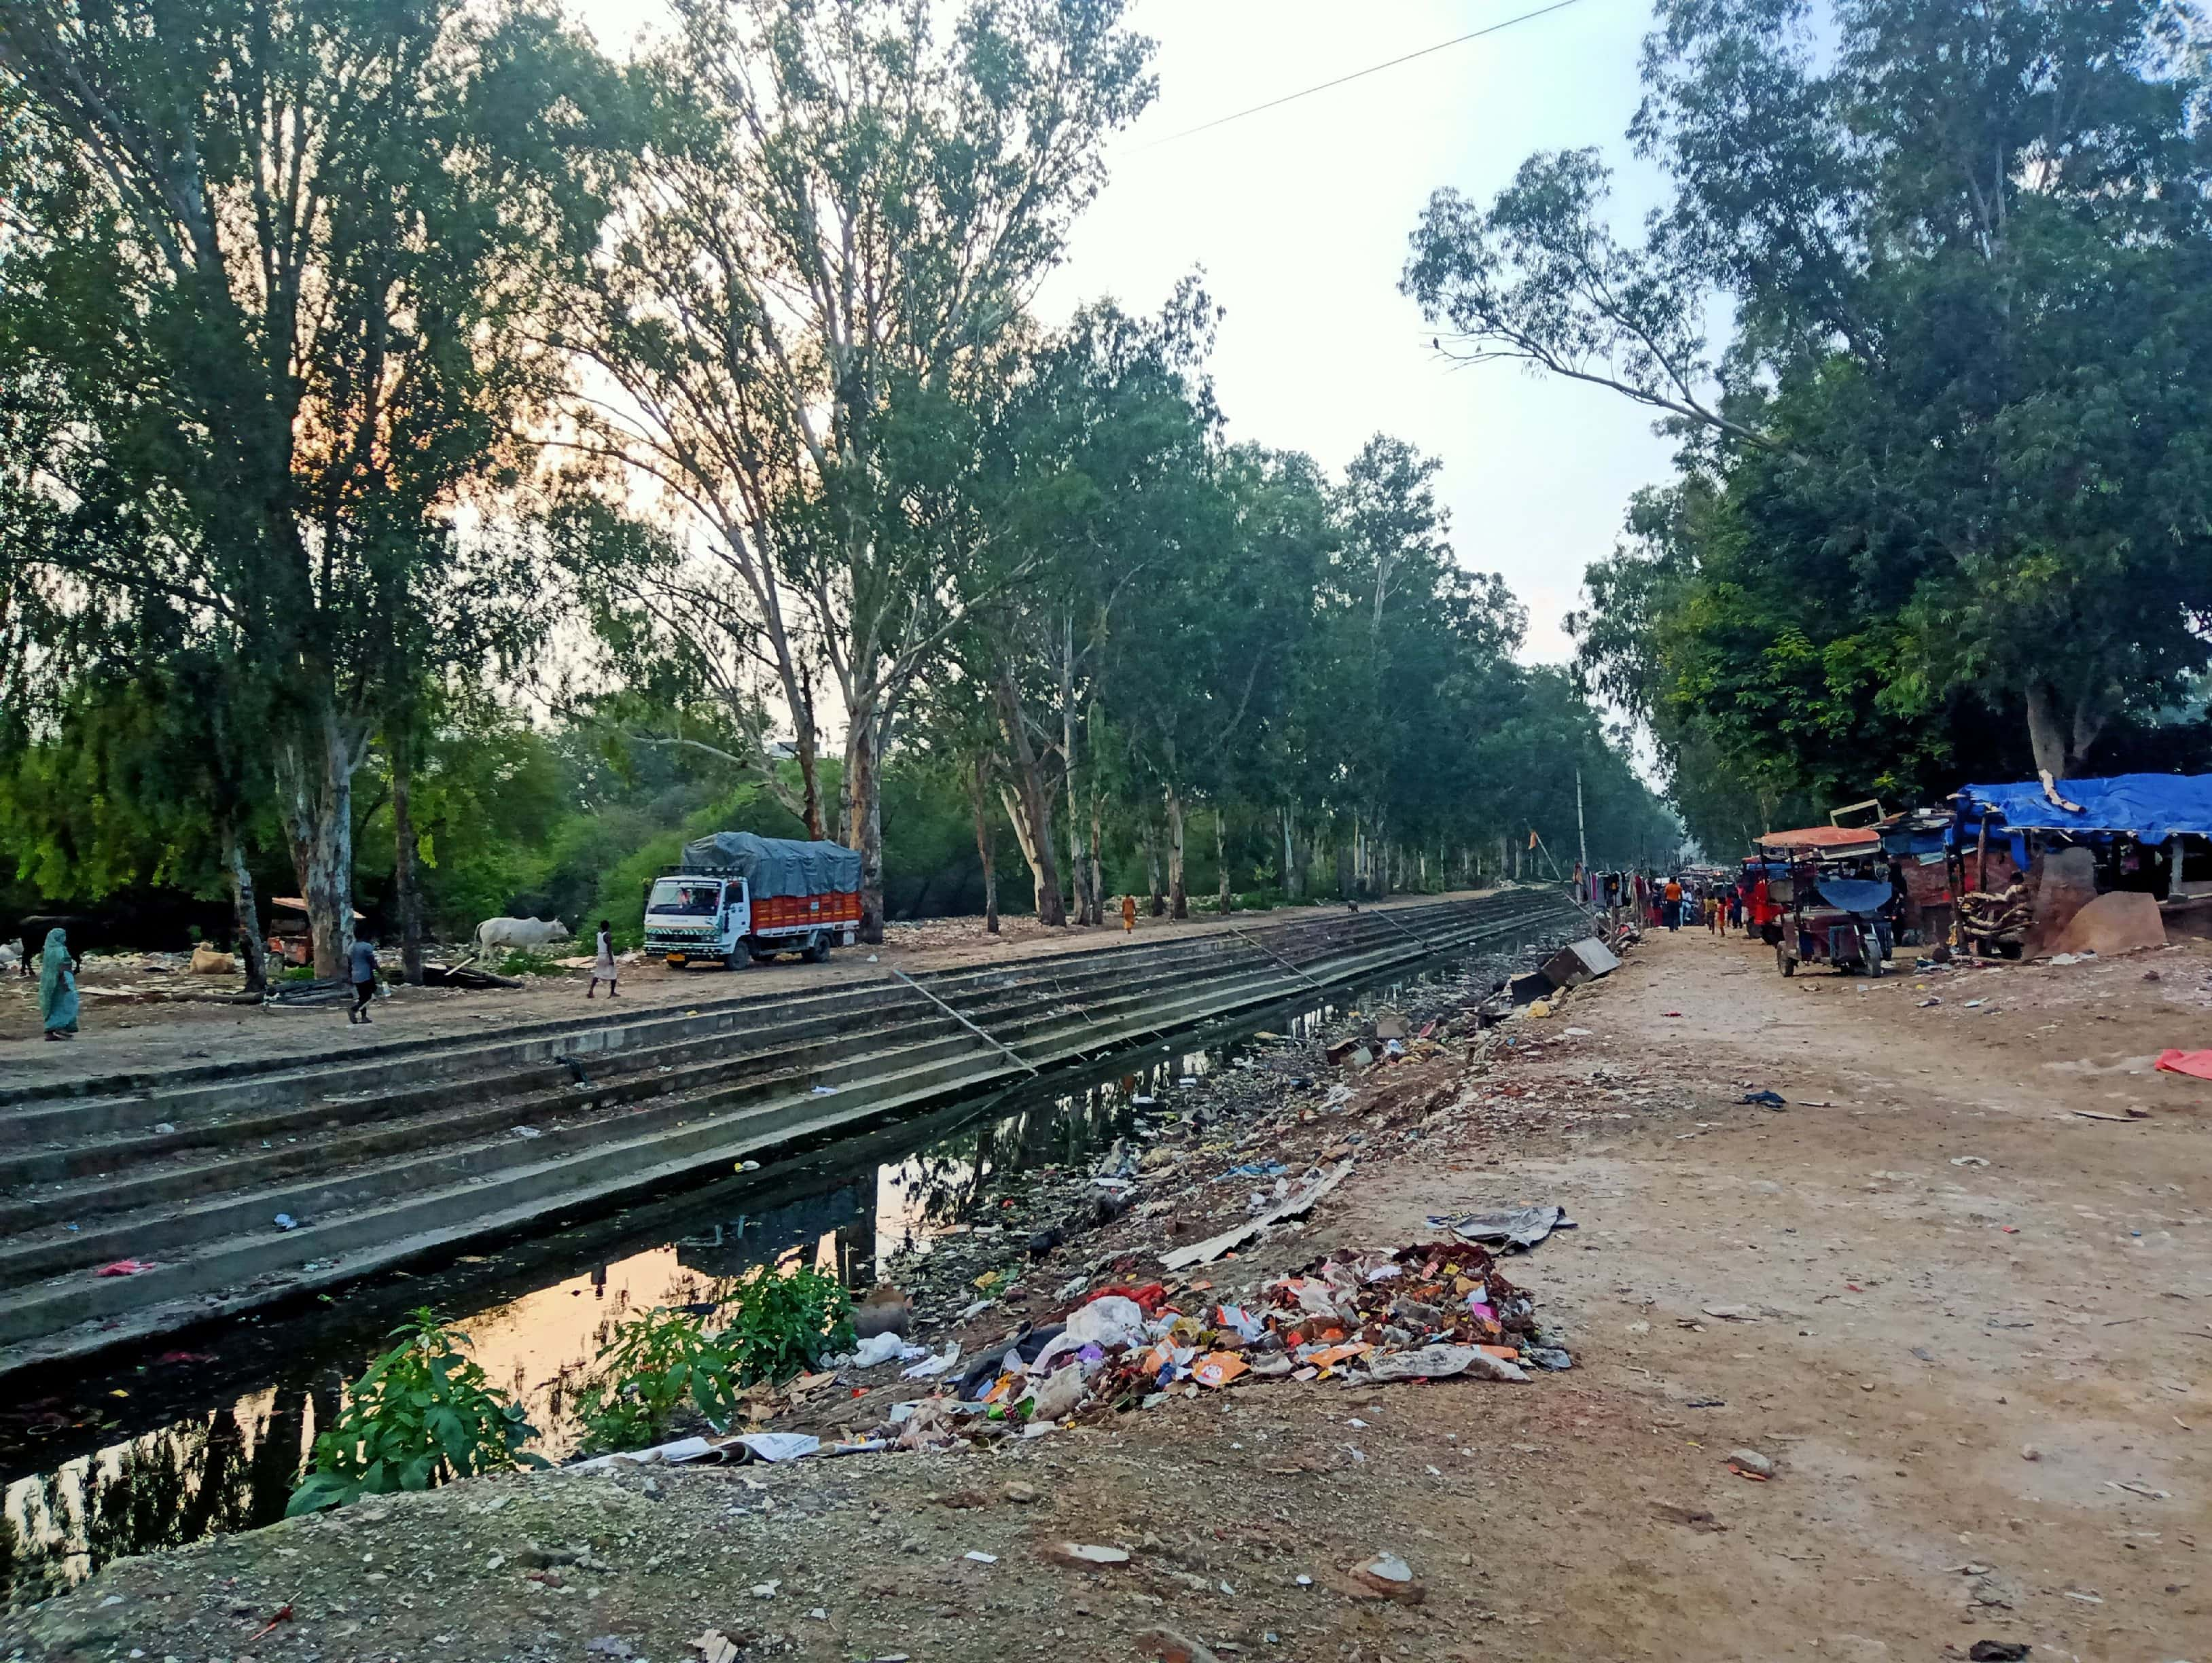 Shalimar Bagh canal